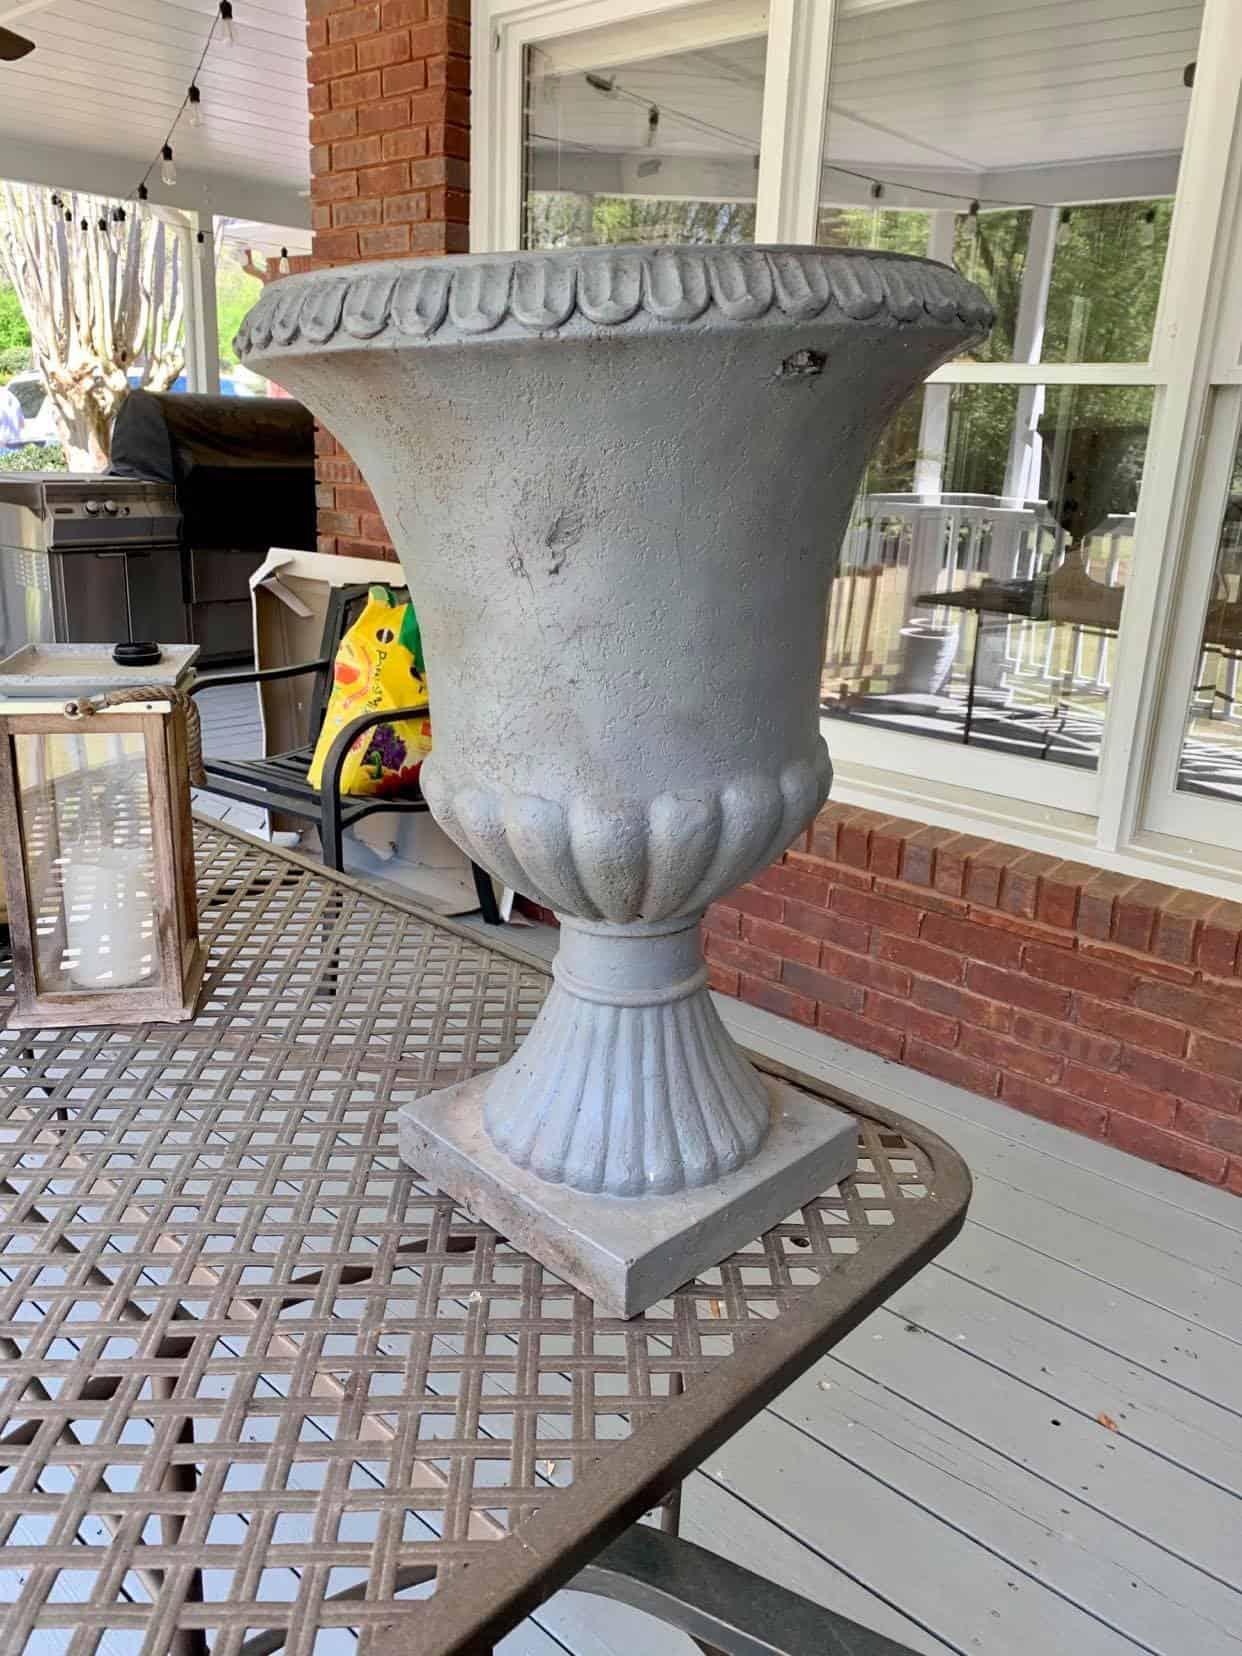 spray paint the plastic urn